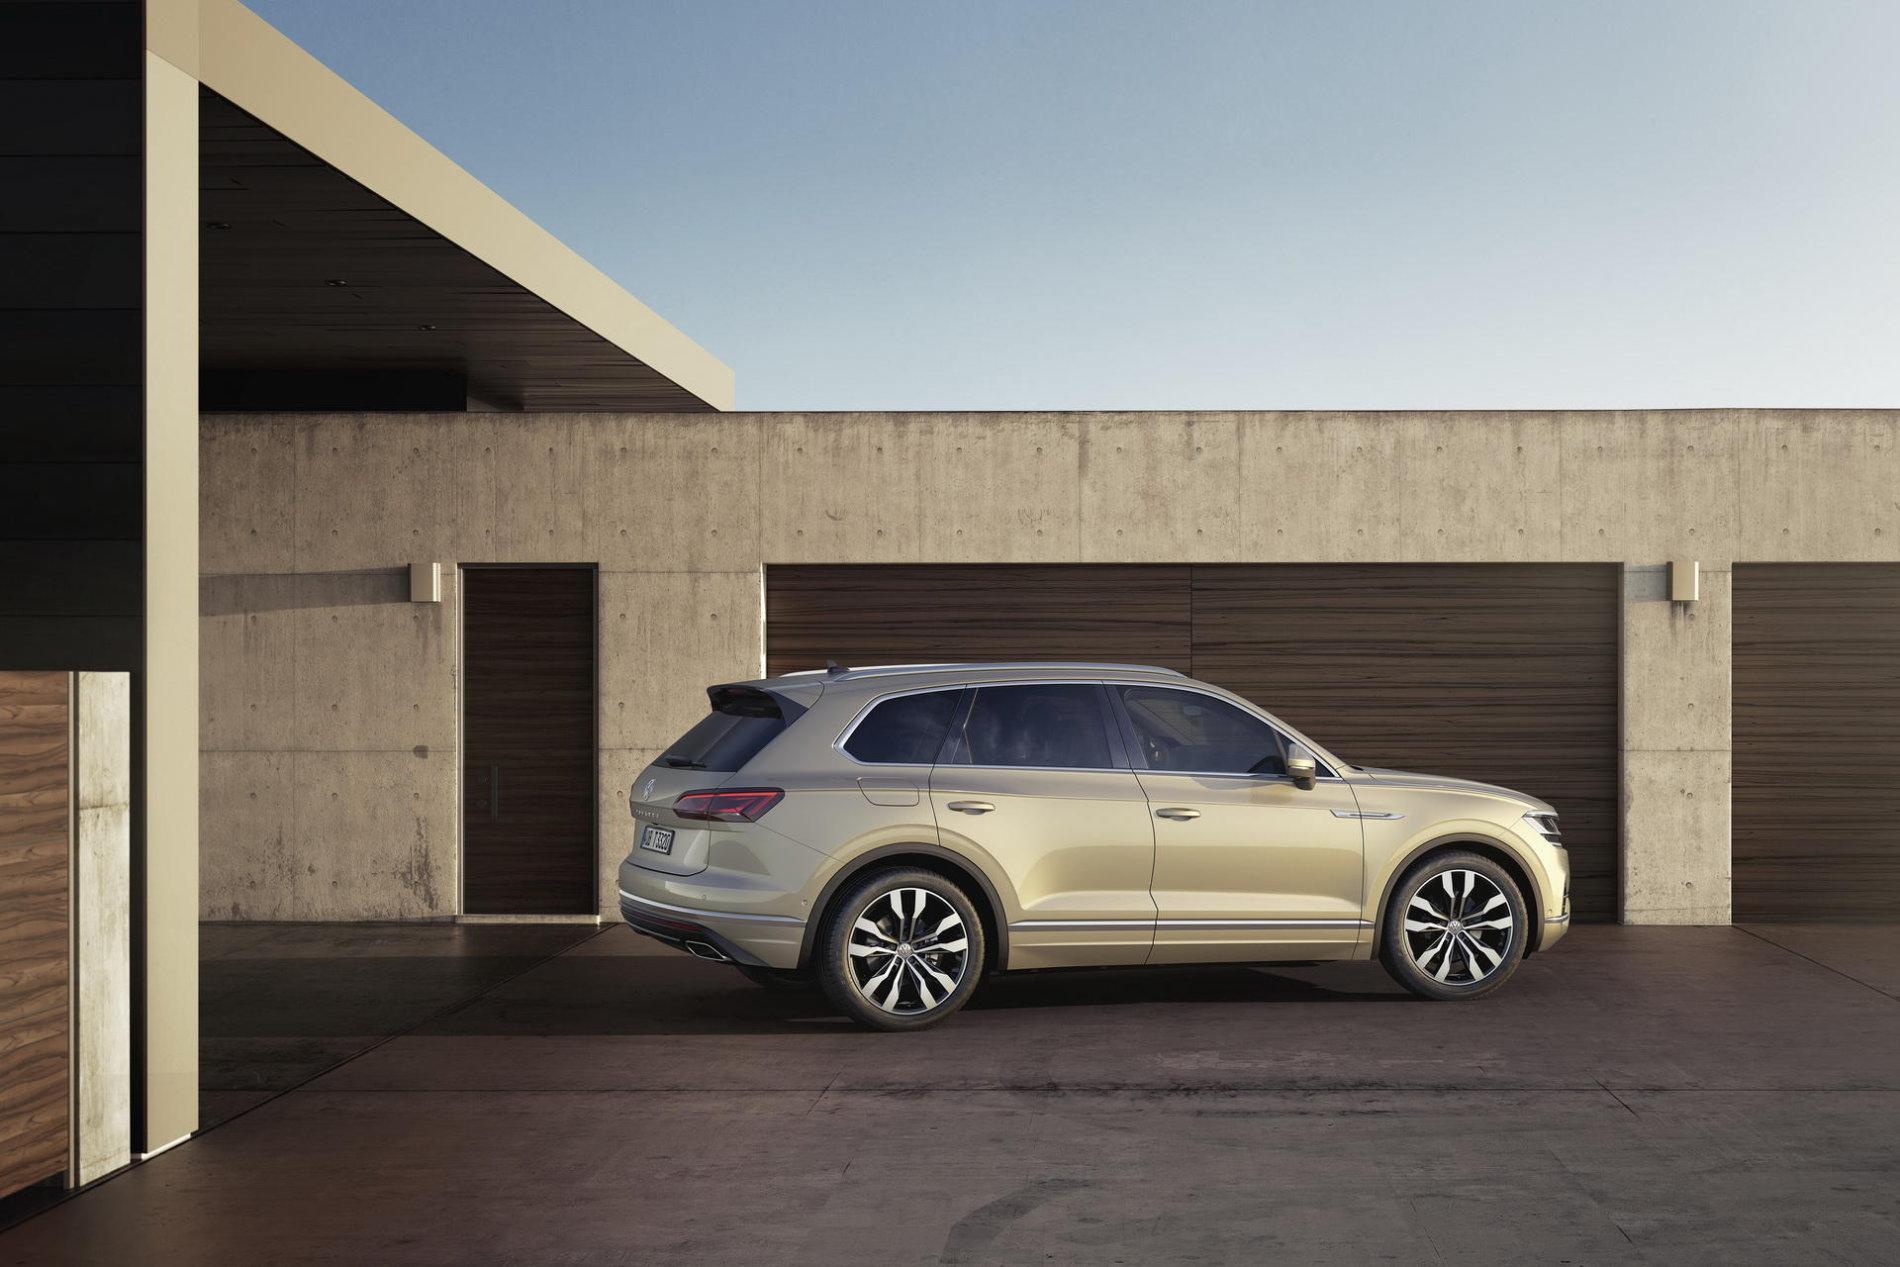 Noul Volkswagen Touareg - Noul Volkswagen Touareg